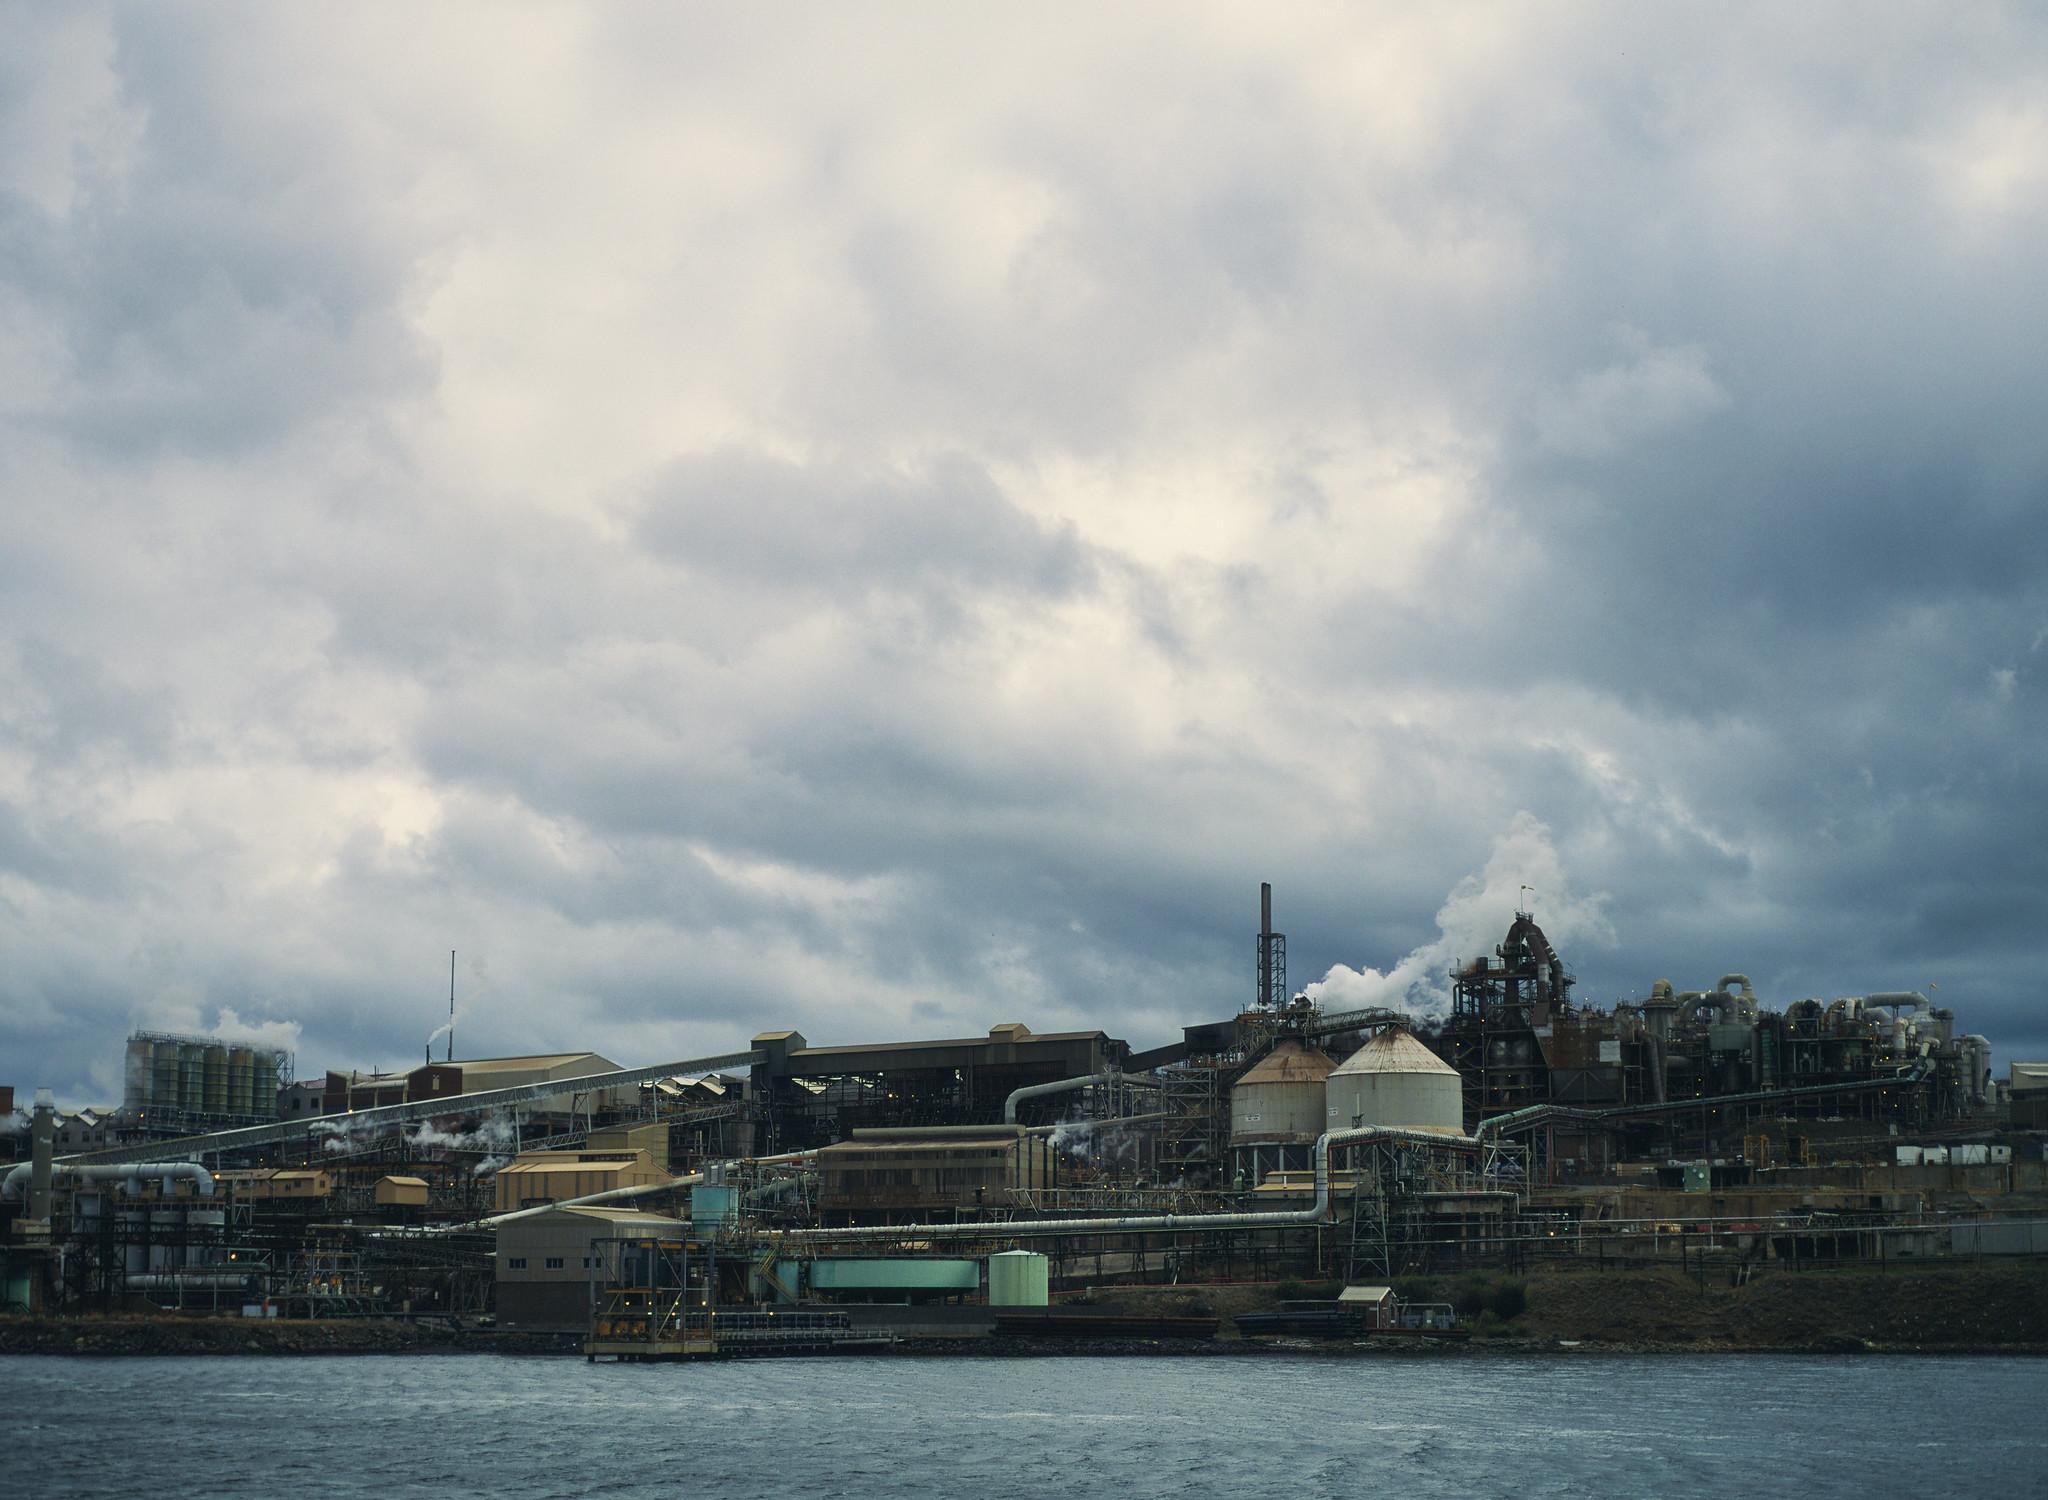 Incat Shipyard